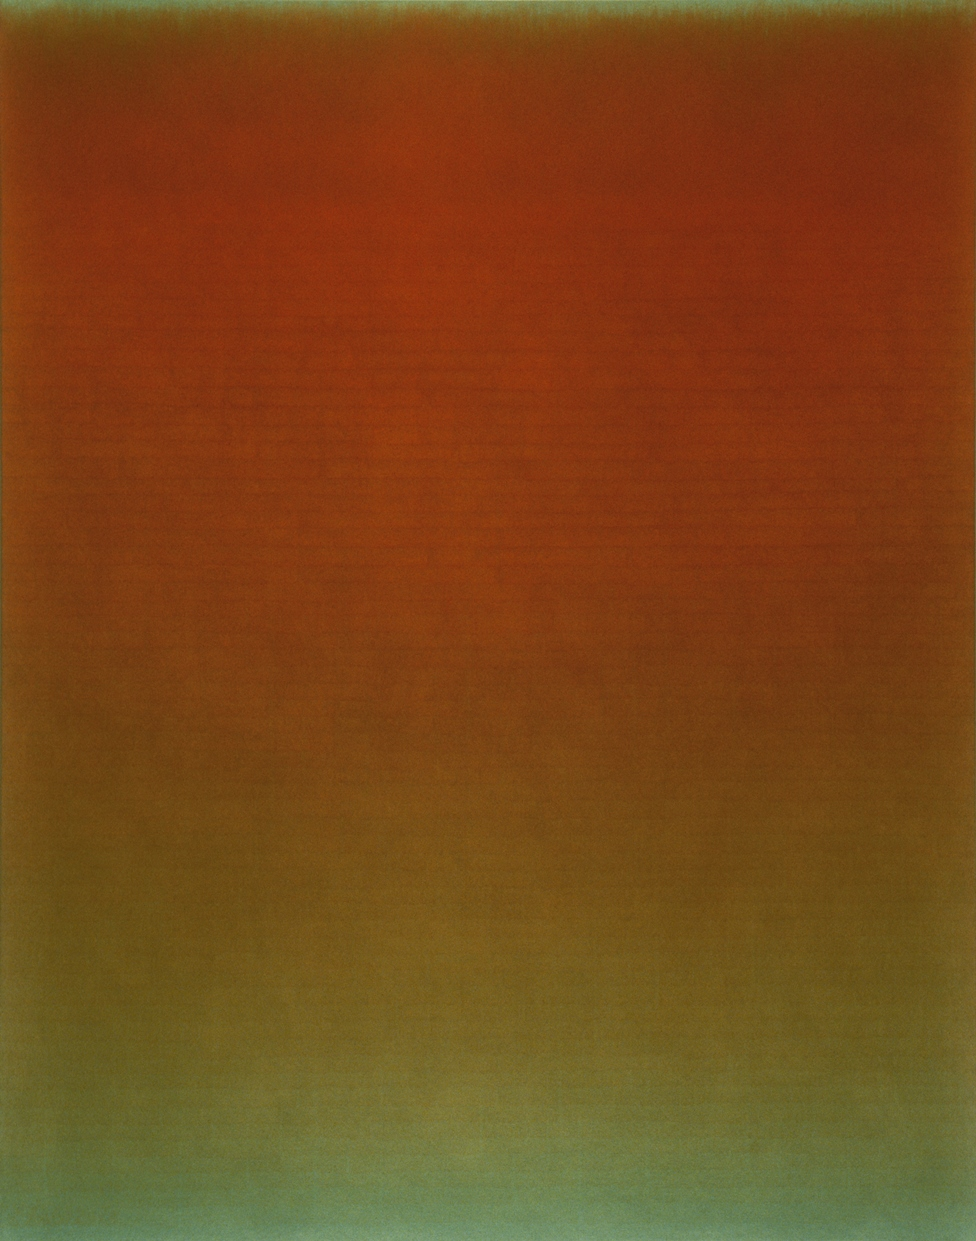 Canvas Contemporary